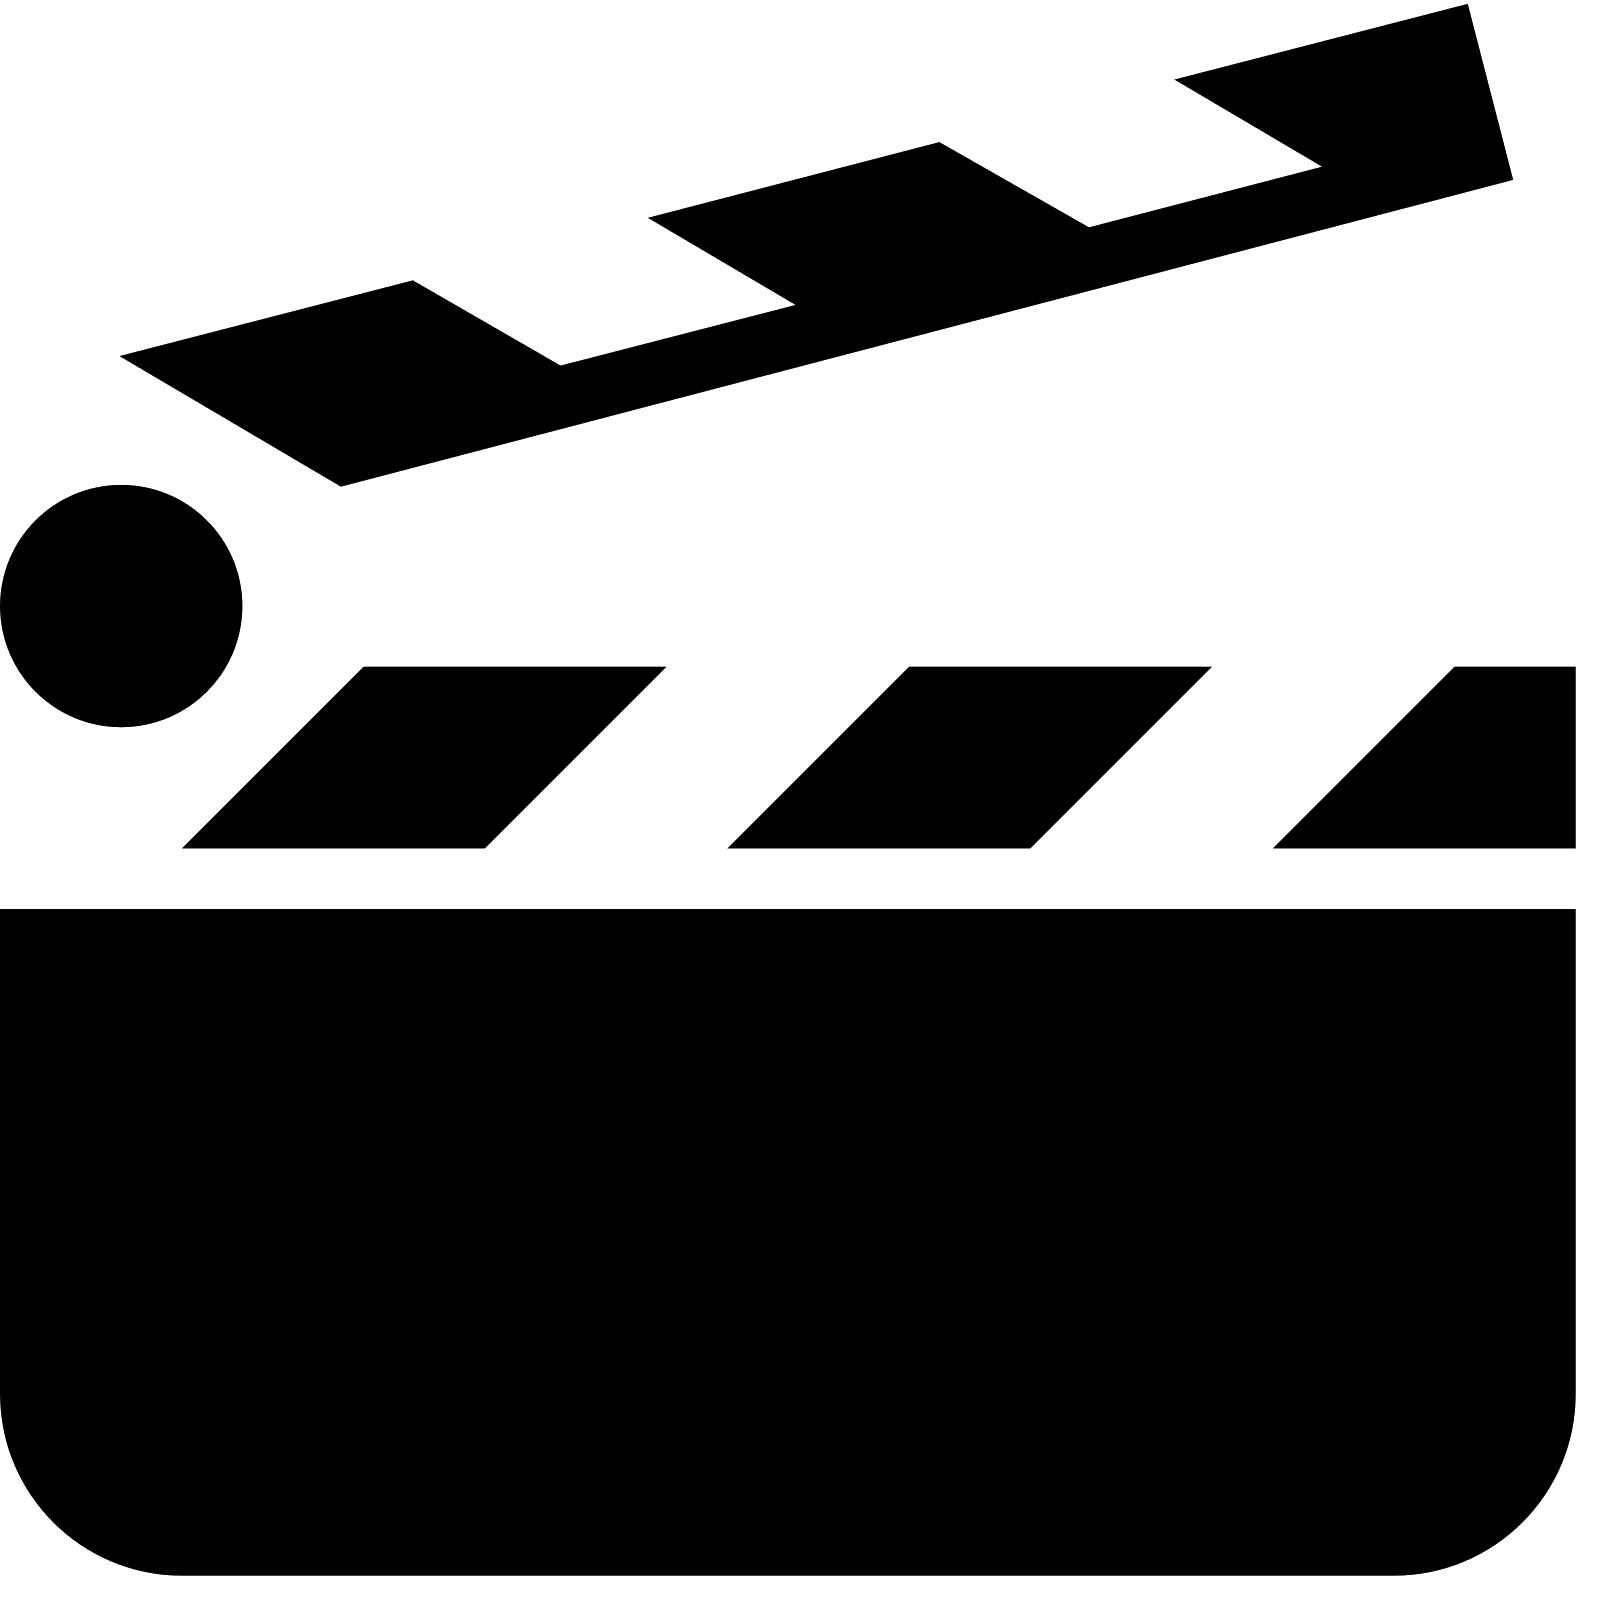 Clapperboard computer icons clip. Film clipart clapper board